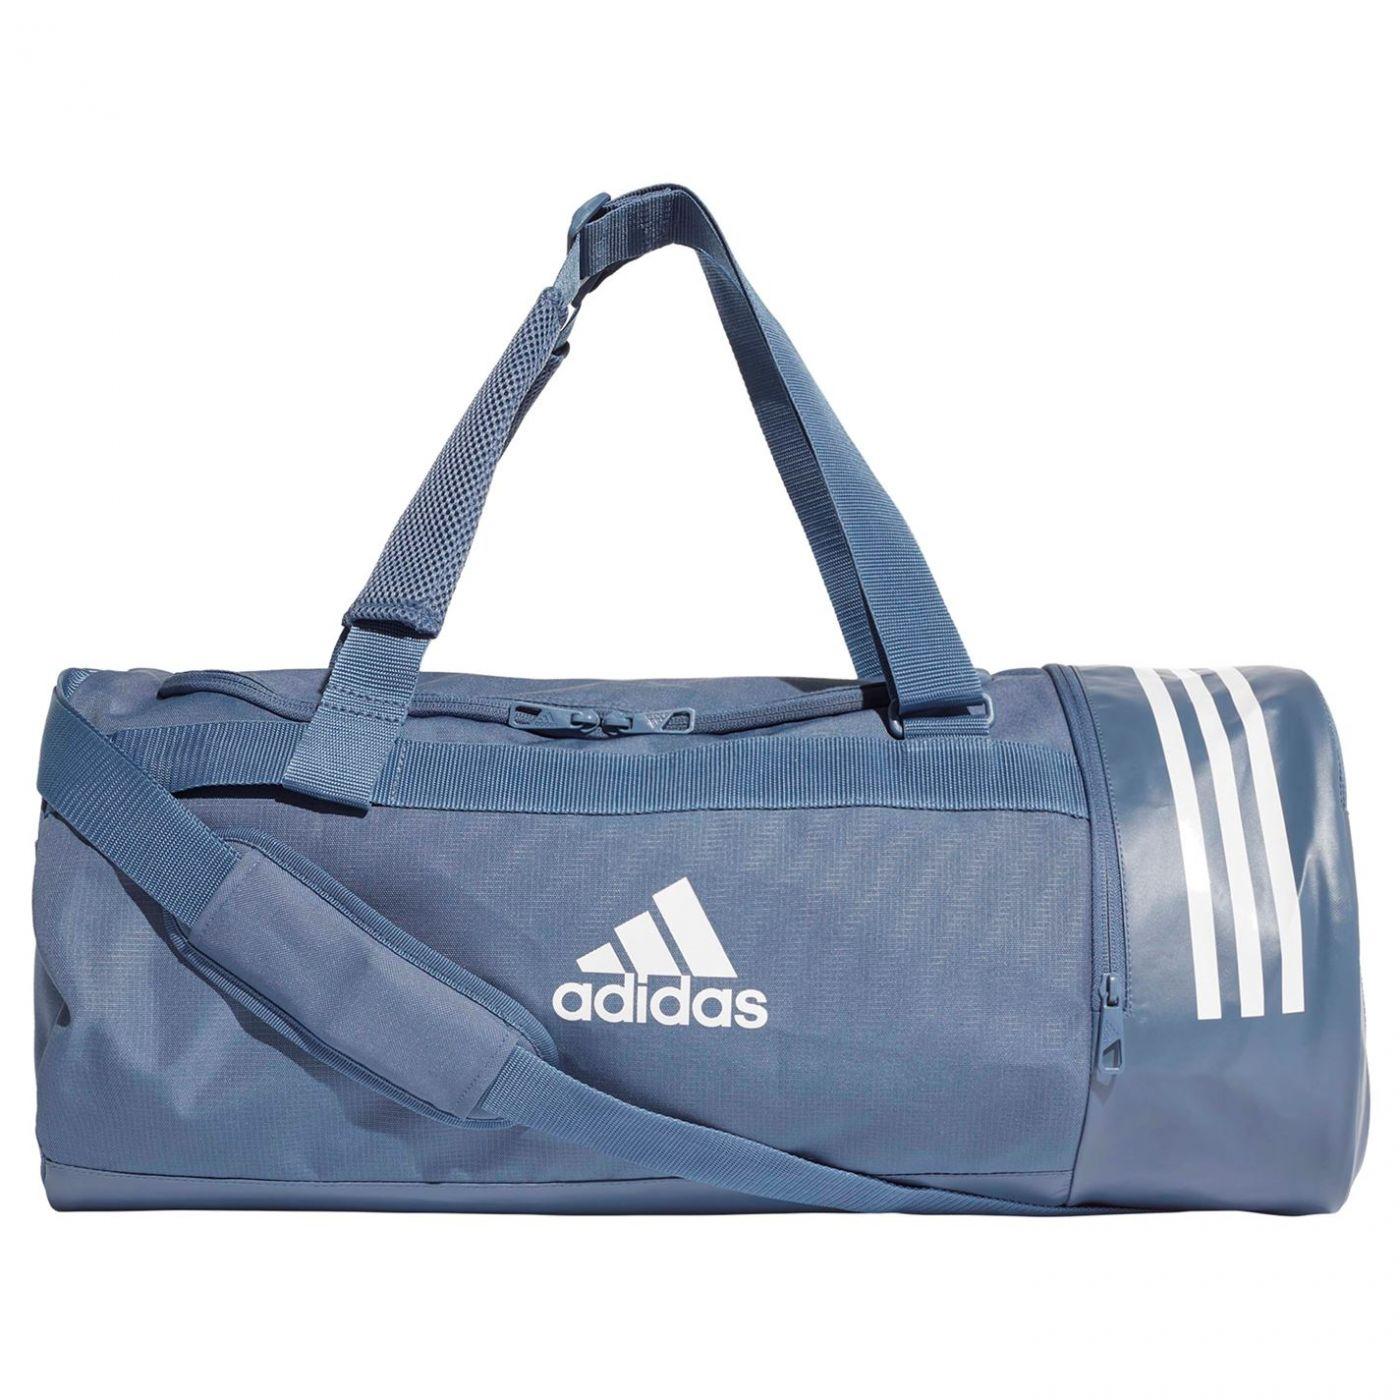 Adidas Convertible 3-Stripes Medium Duffel Bag